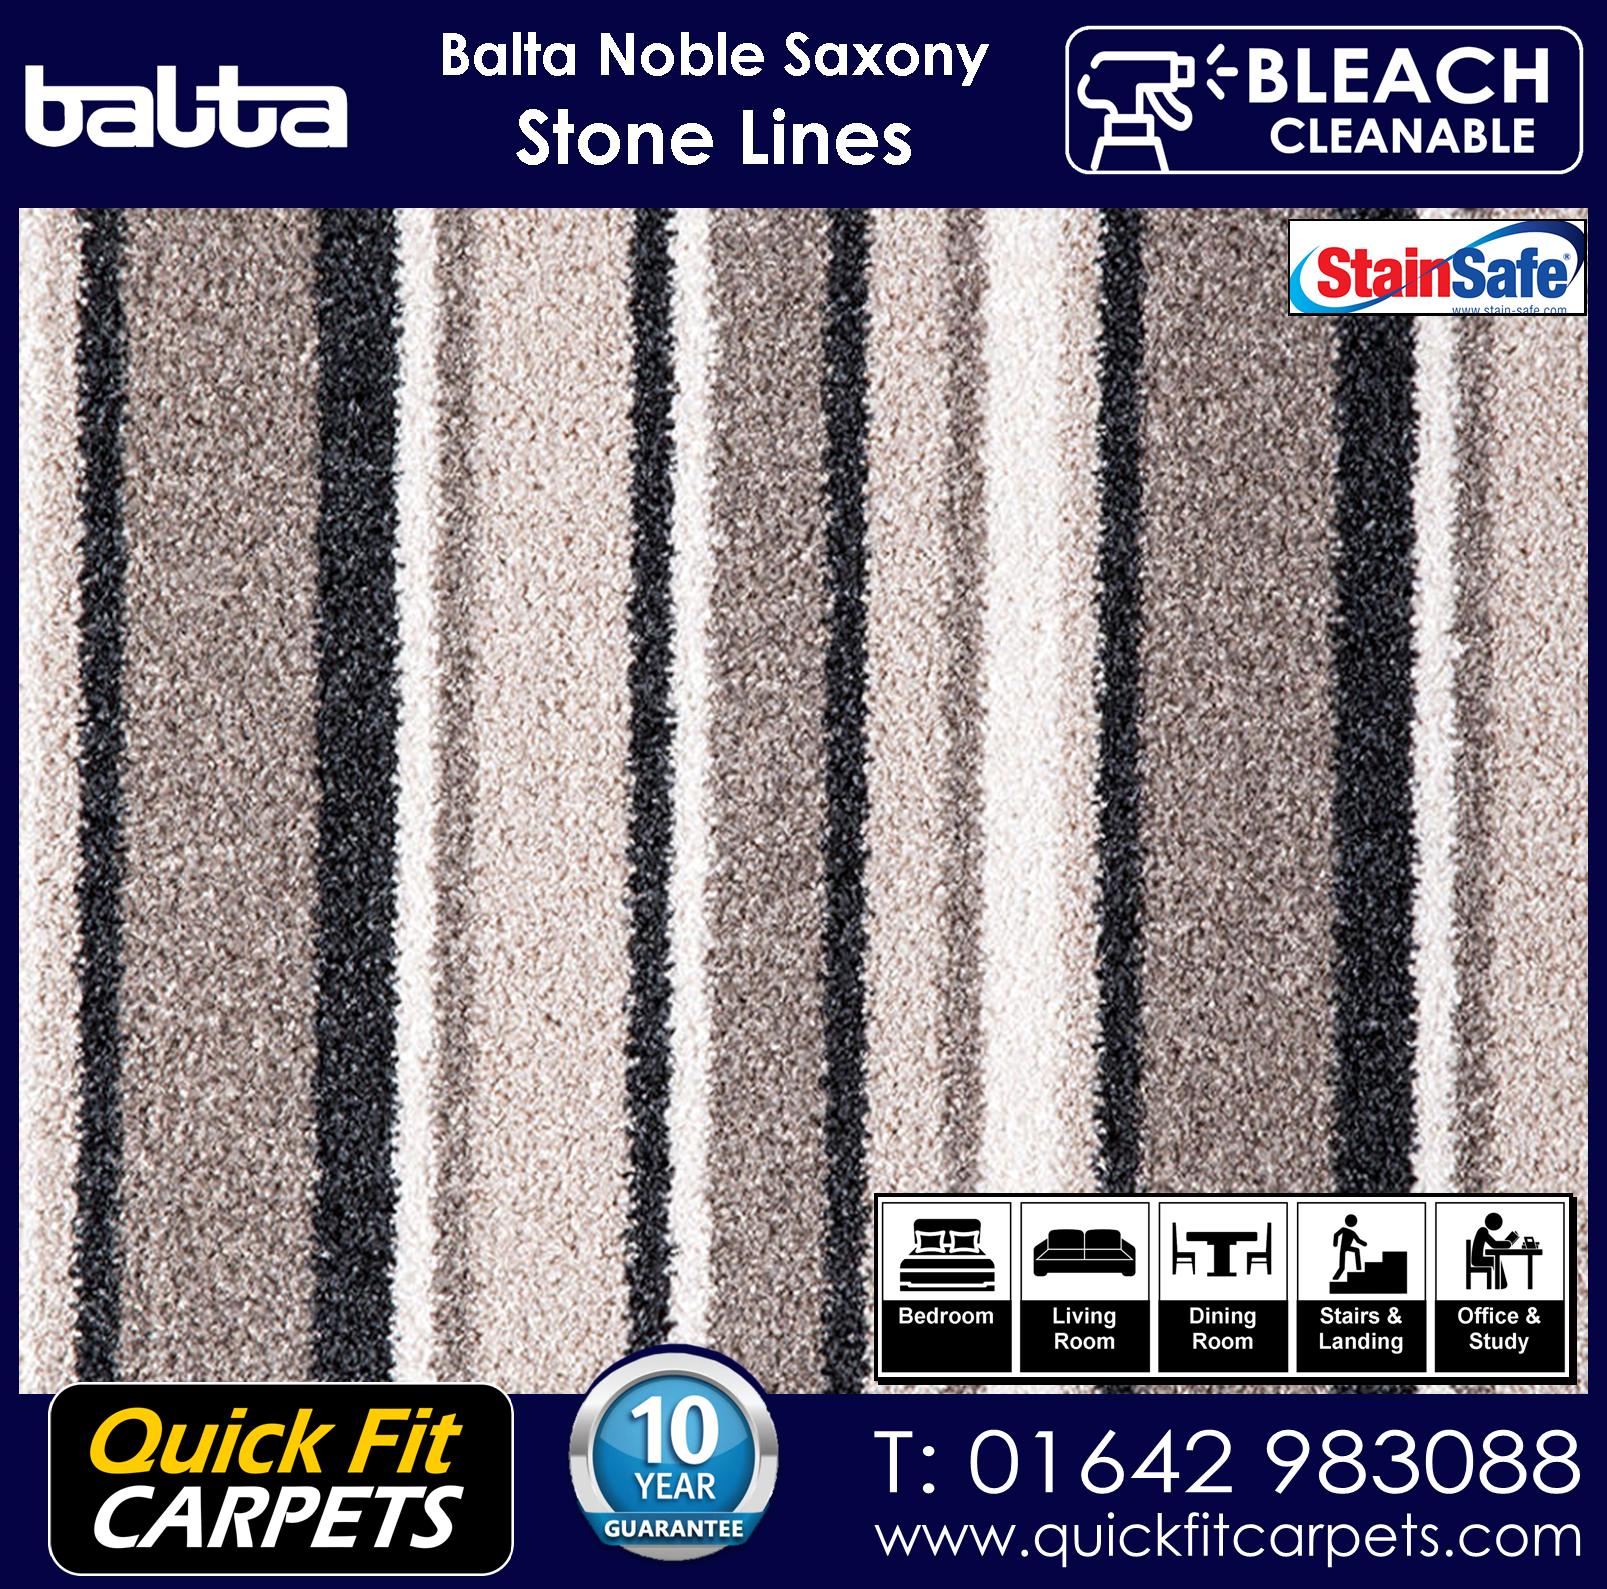 Quick Fit Carpets Balta Luxury Pile Stone Lines